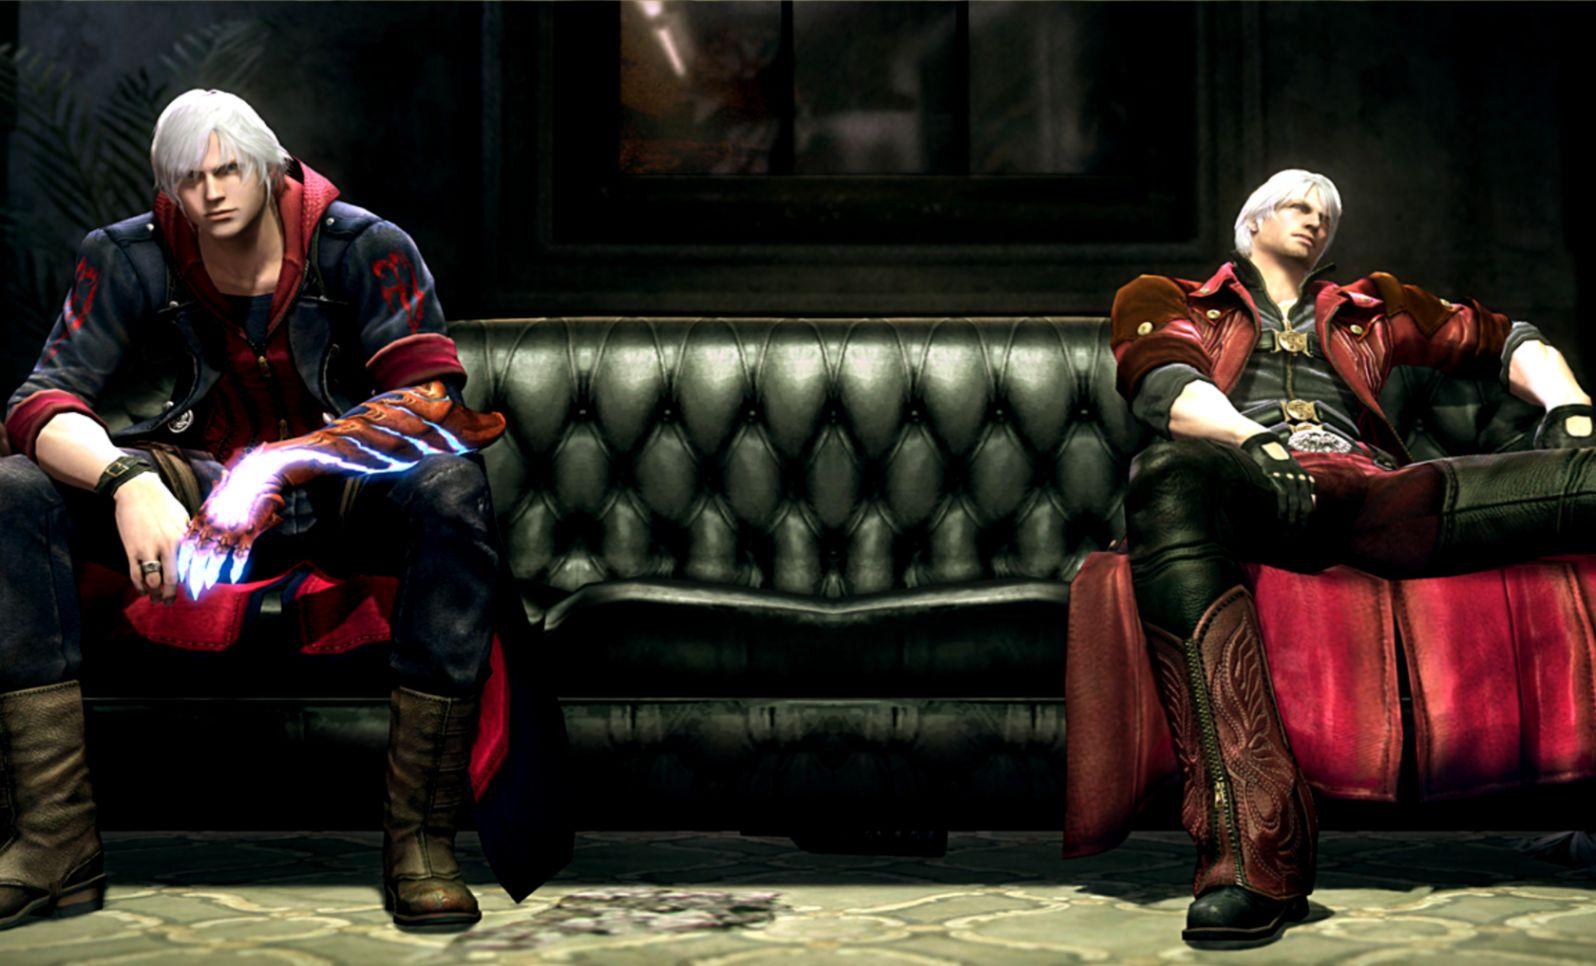 Devil May Cry Dmc Devil May Cry Video Games Dante Devil Nero